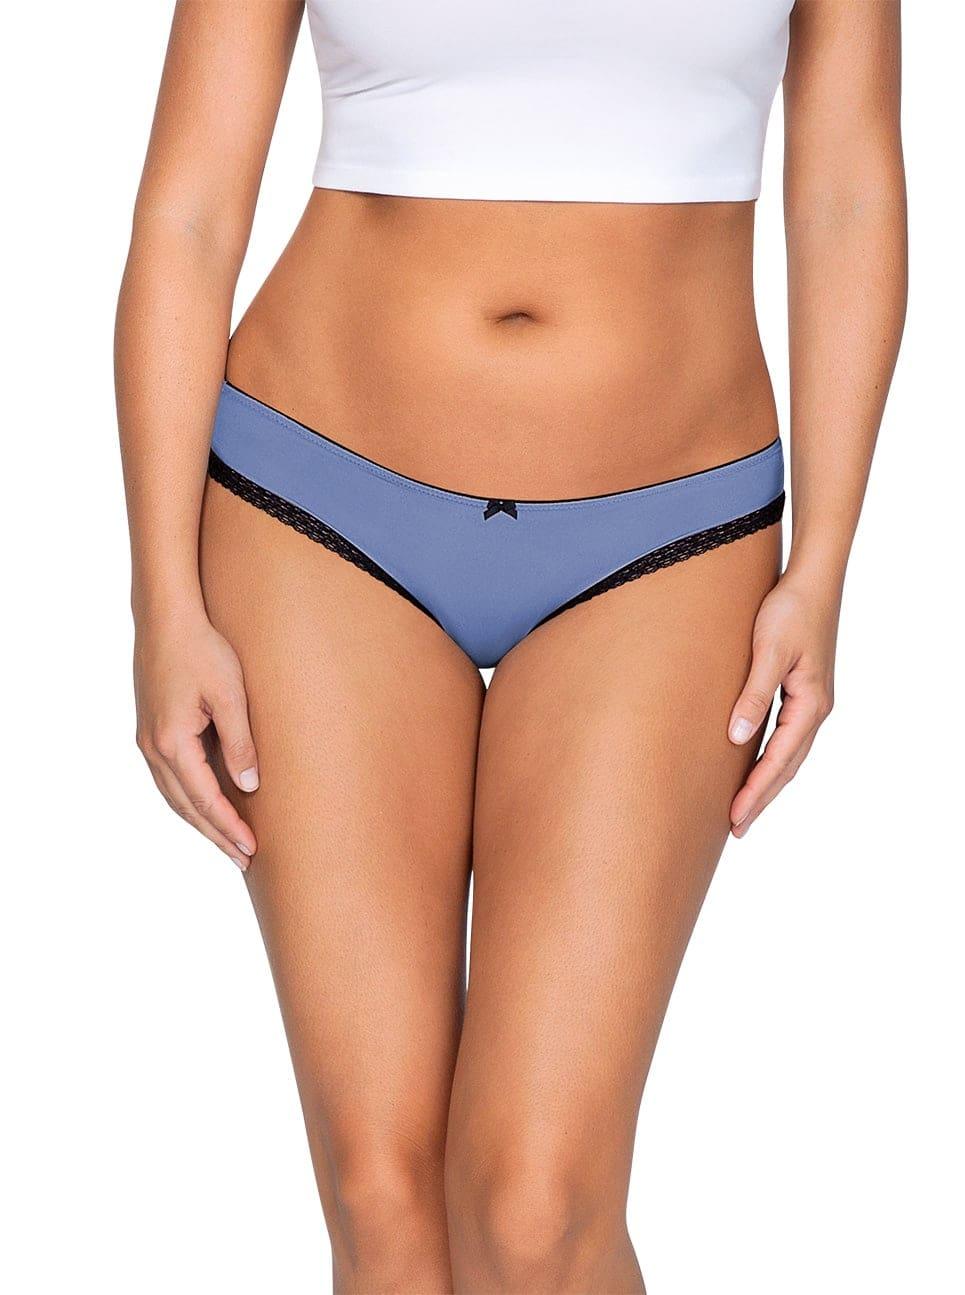 ParfaitPantyBikini PP301 C SilverBlueFront main - Panty So Lovely Bikini Silver Blue PP301